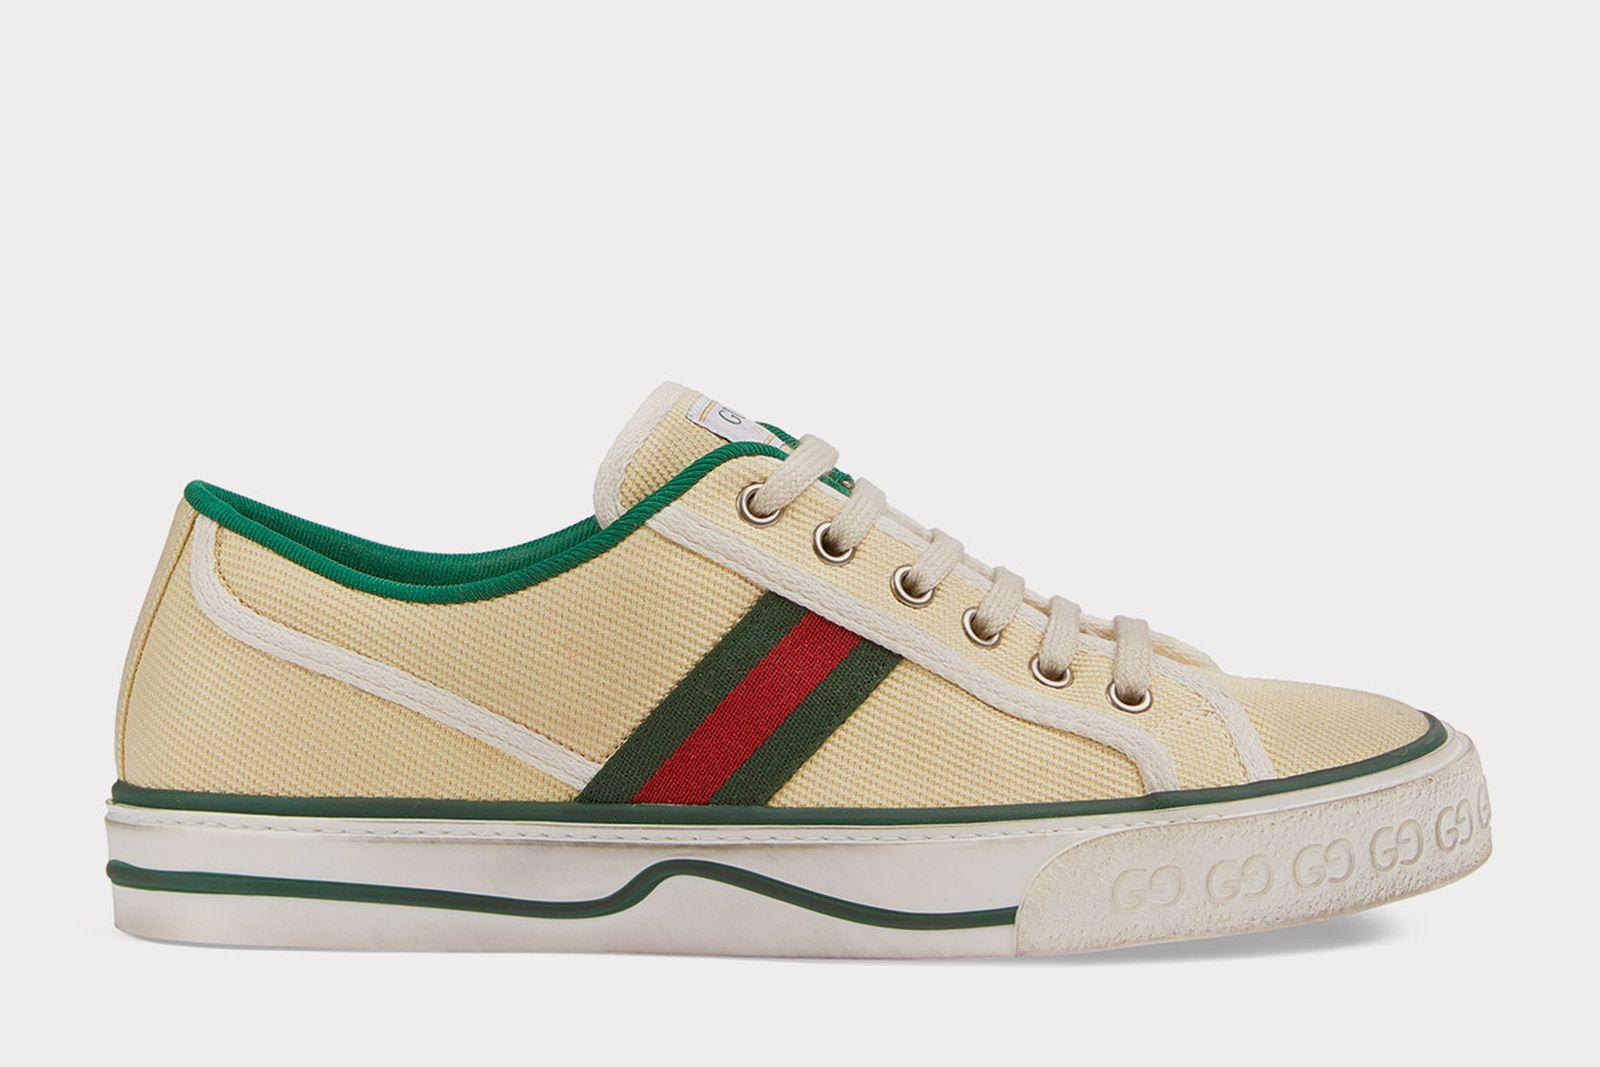 gucci-tennis-1977-release-date-price-03